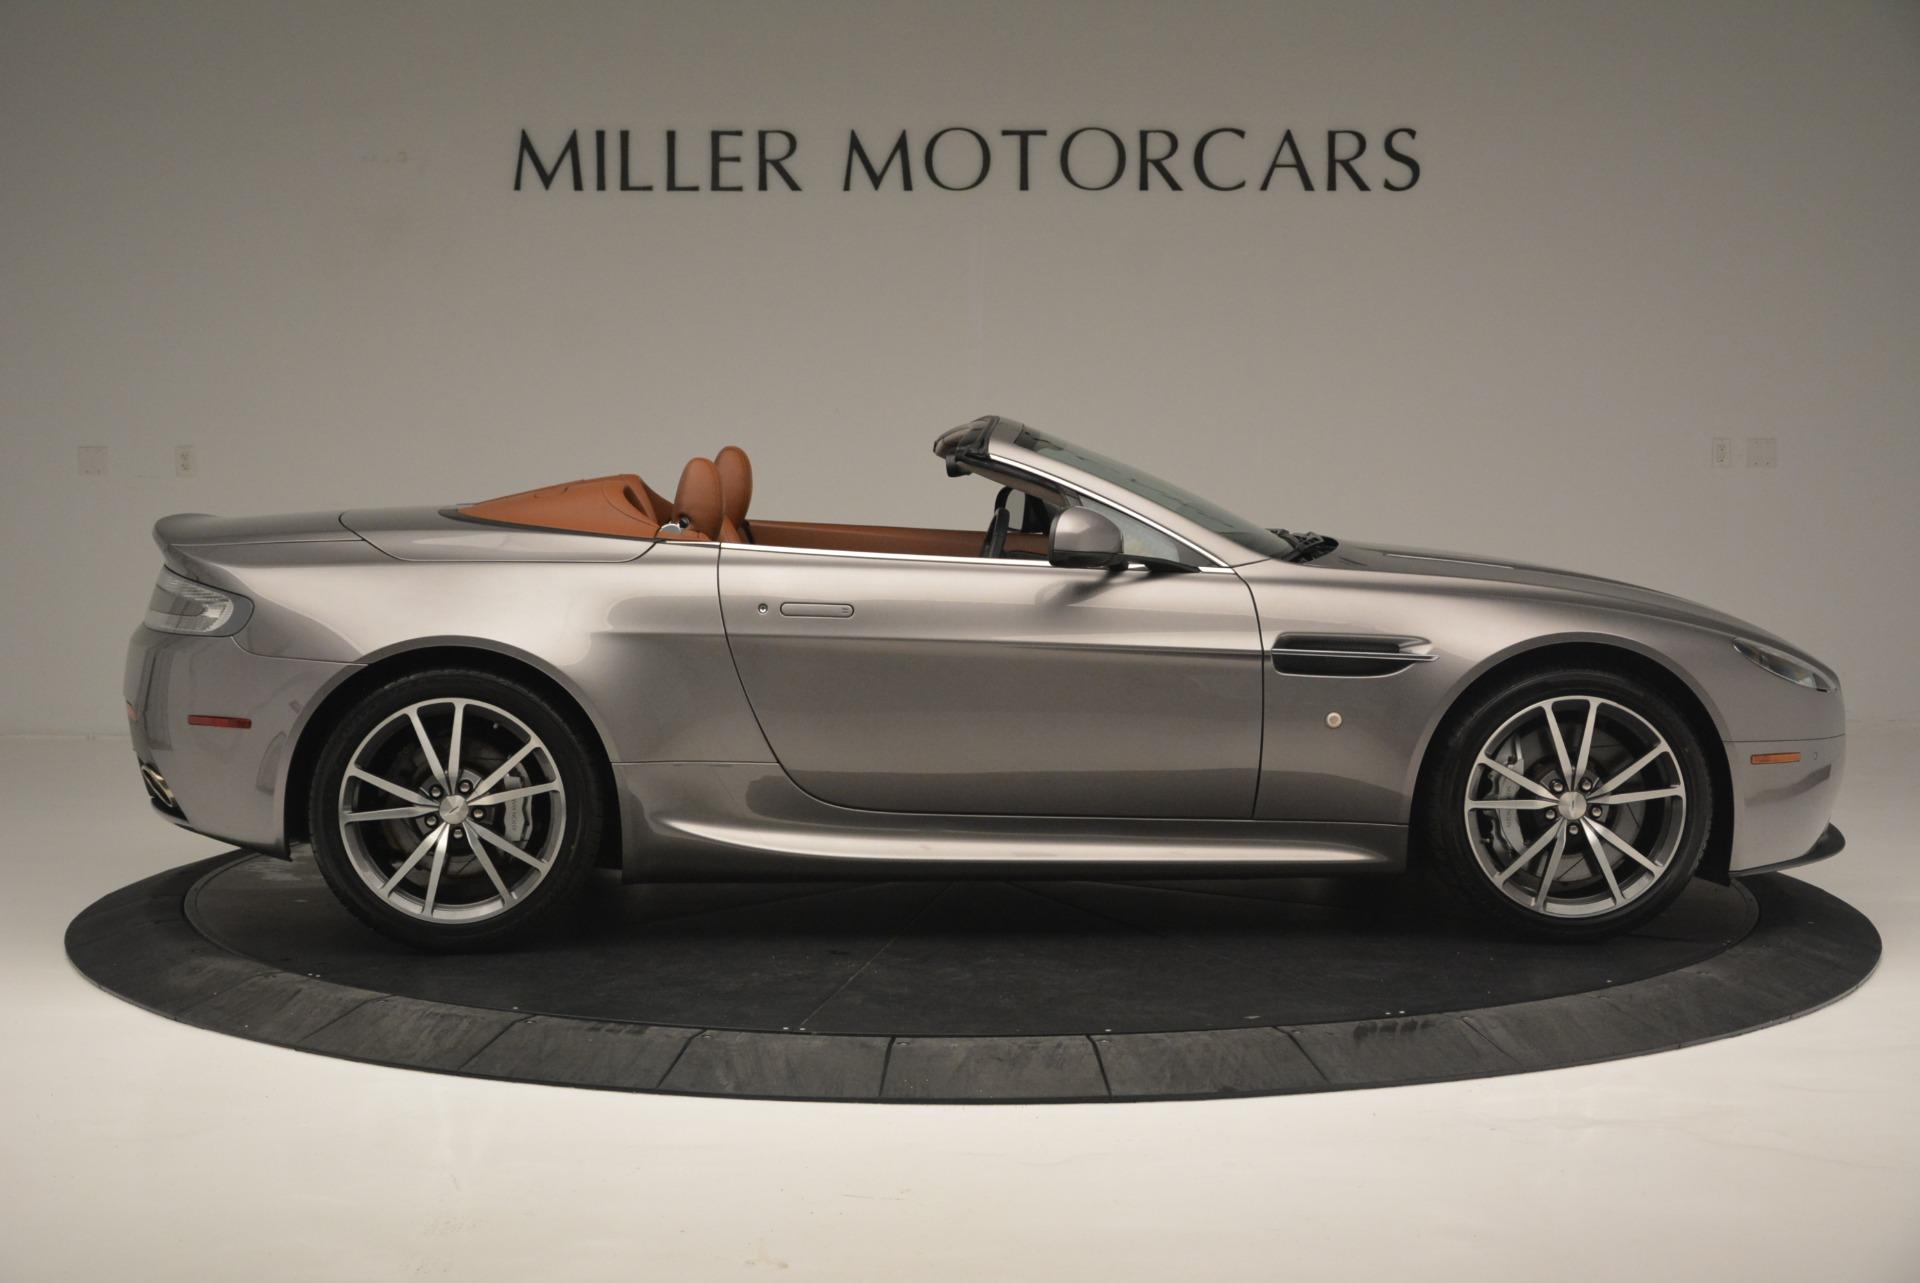 Used 2015 Aston Martin V8 Vantage Roadster For Sale In Greenwich, CT. Alfa Romeo of Greenwich, 7396 2463_p9